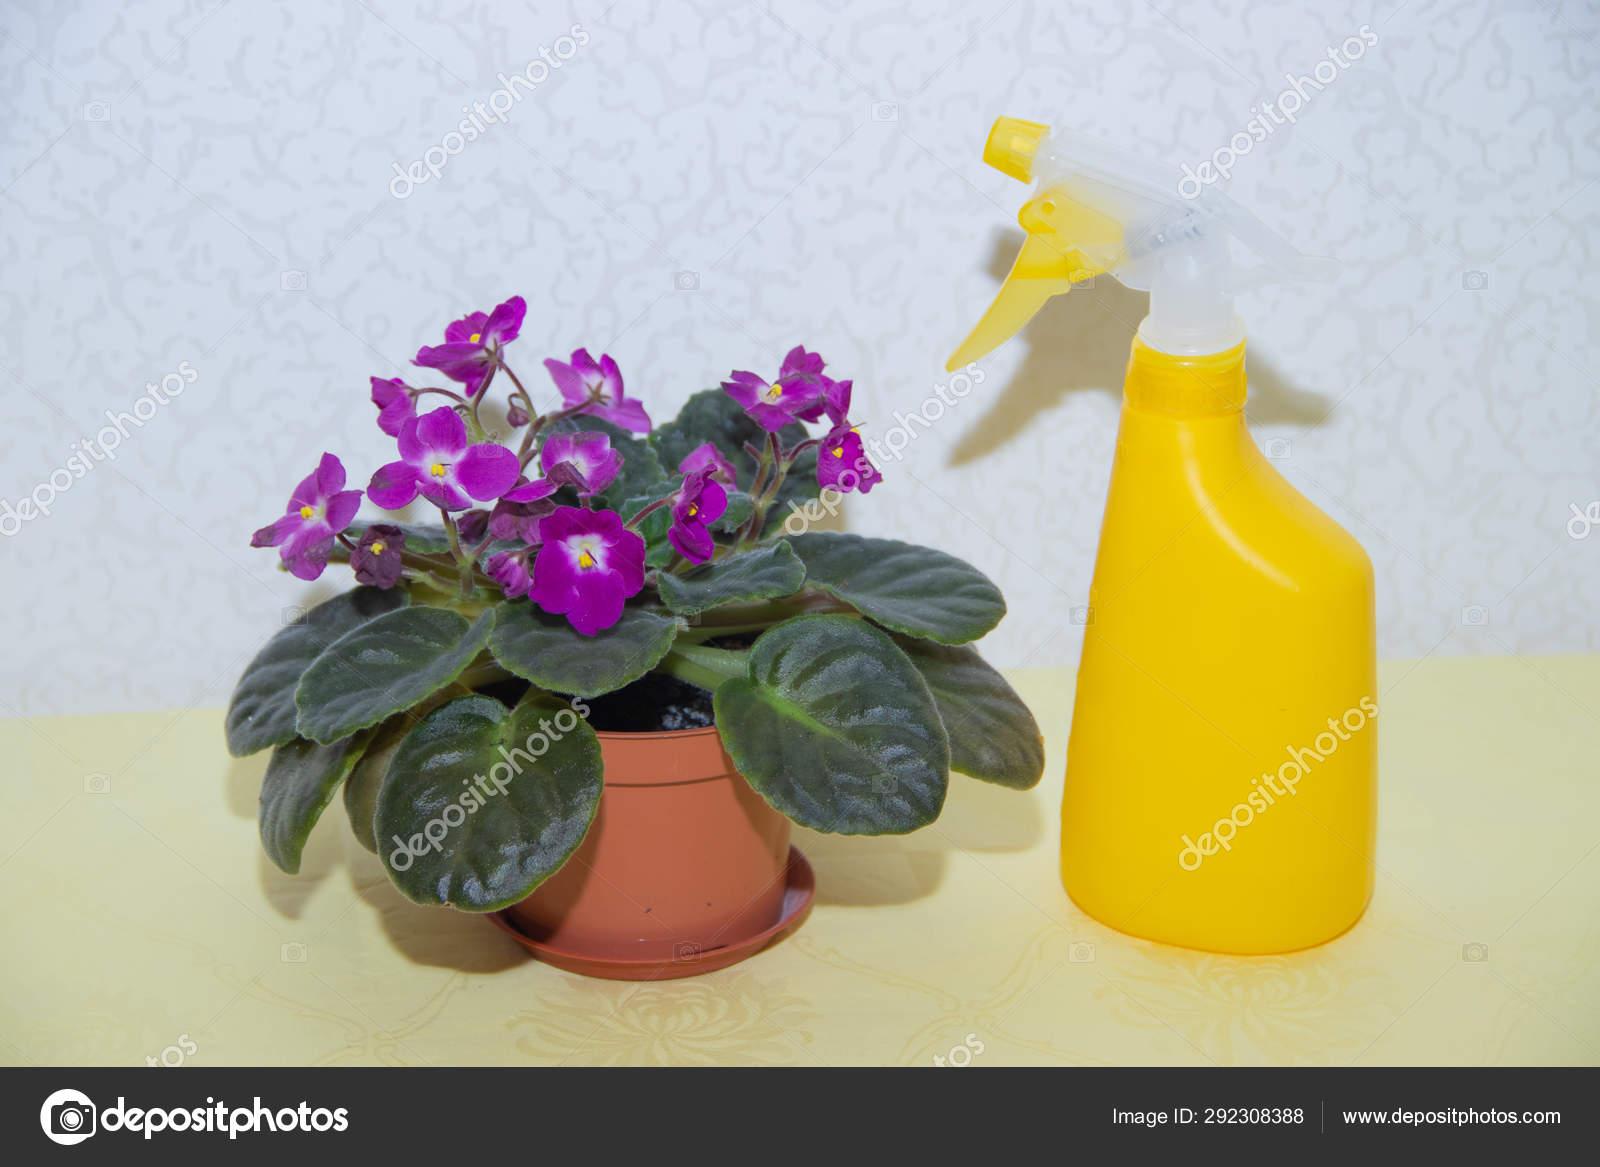 Homemade Flower Violet And Sprayer For Flowers Purple Flower